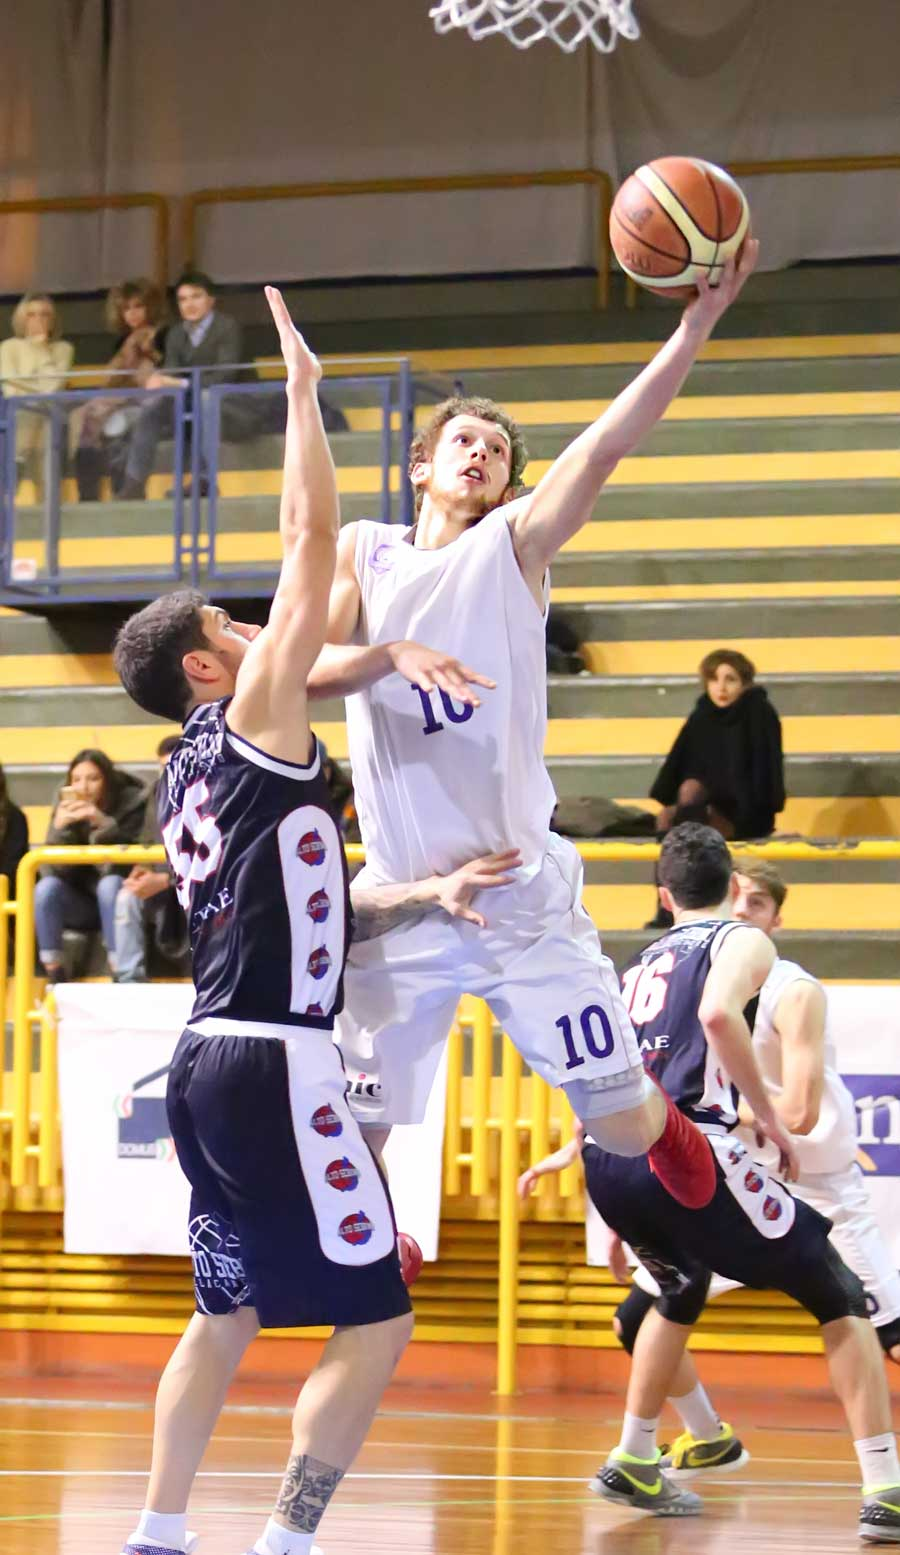 05_lasagni_basket_fiorentina_altosebino2016